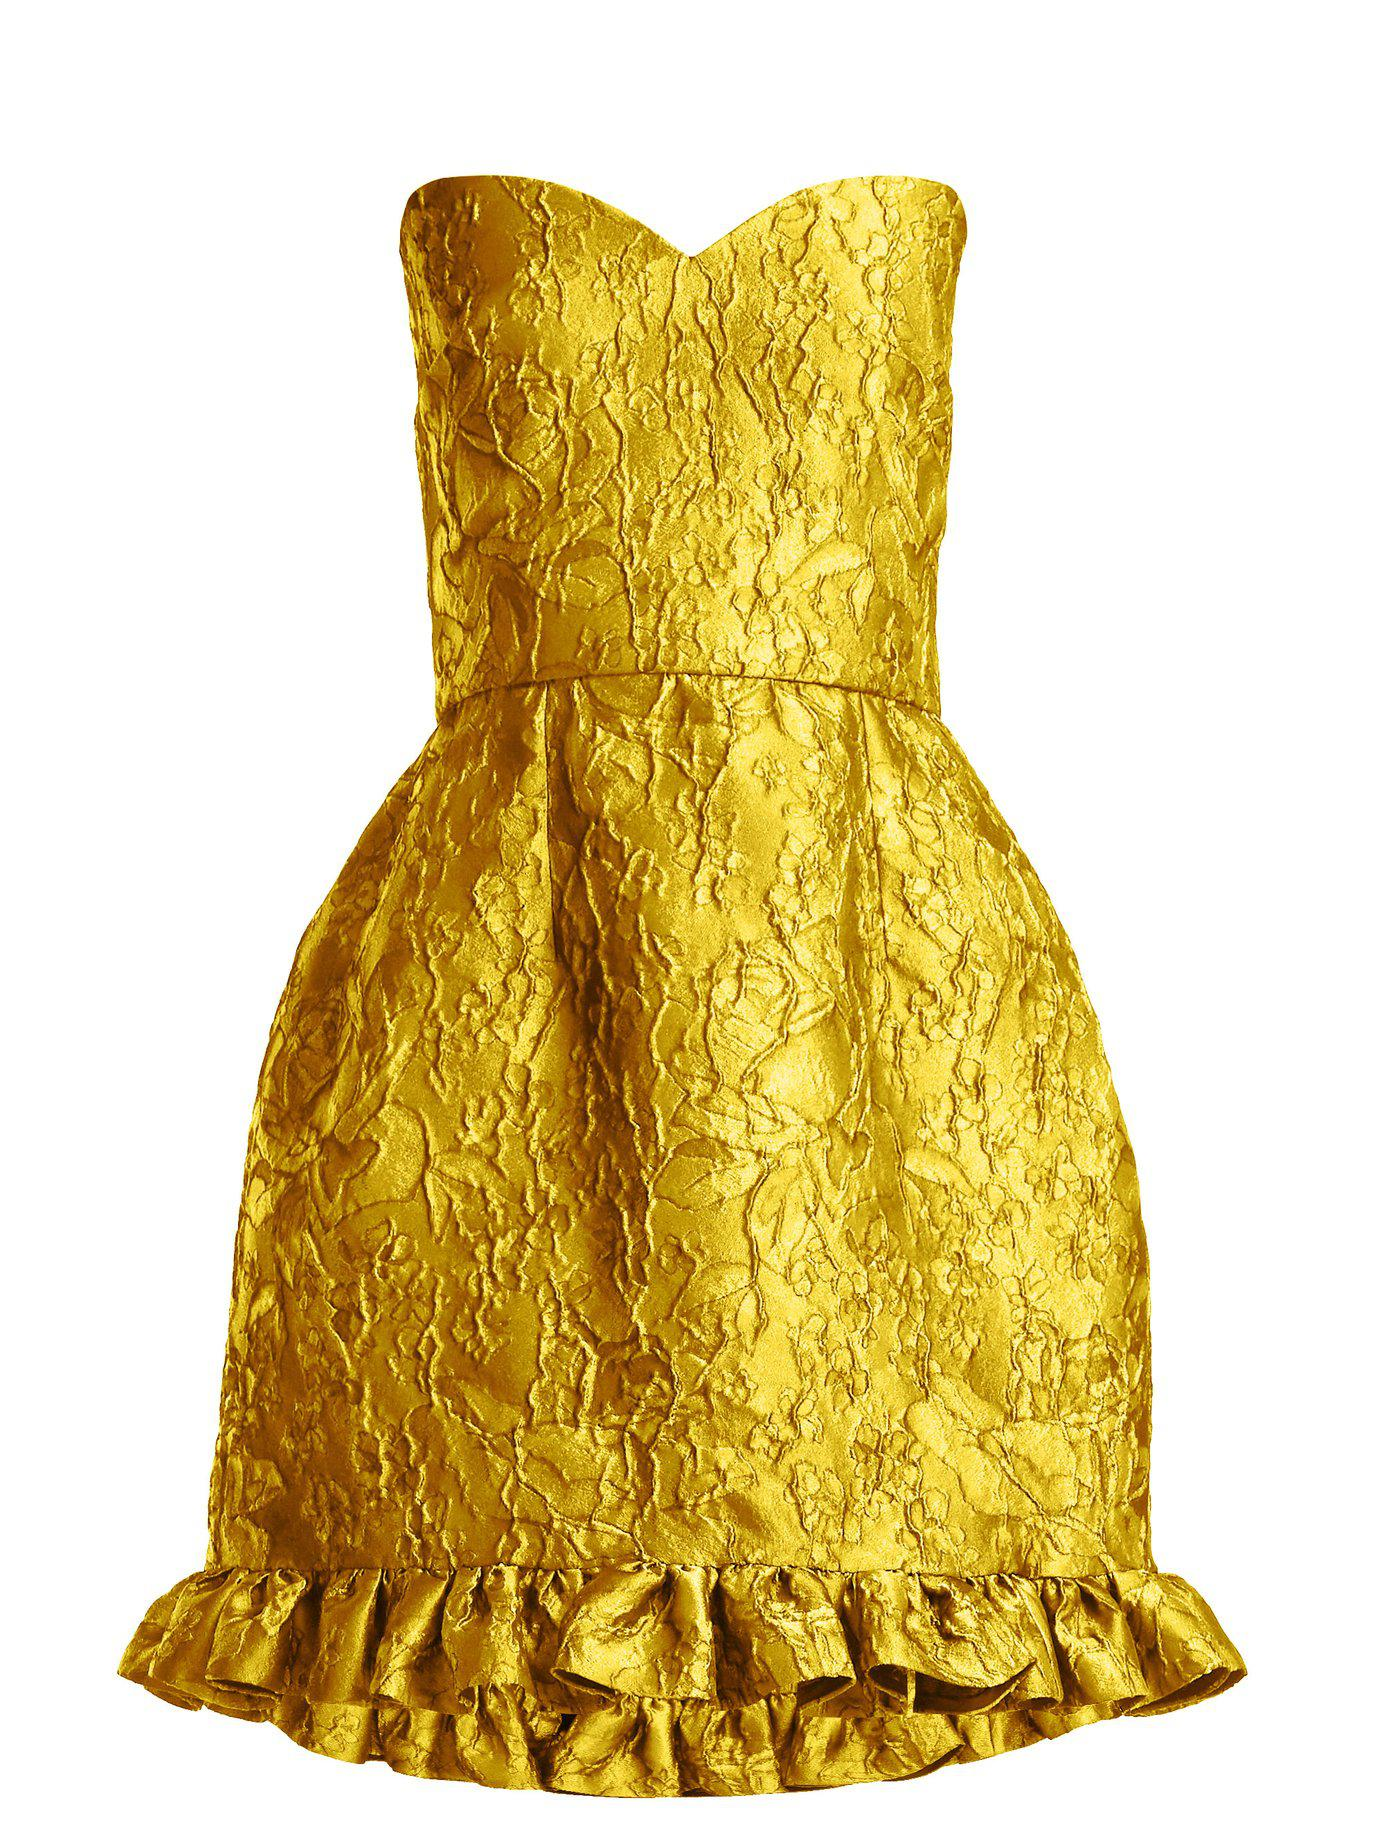 b0b2c53430c0 Emilio de la Morena. Women's Yellow Golde Floral Jacquard Strapless Mini  Dress